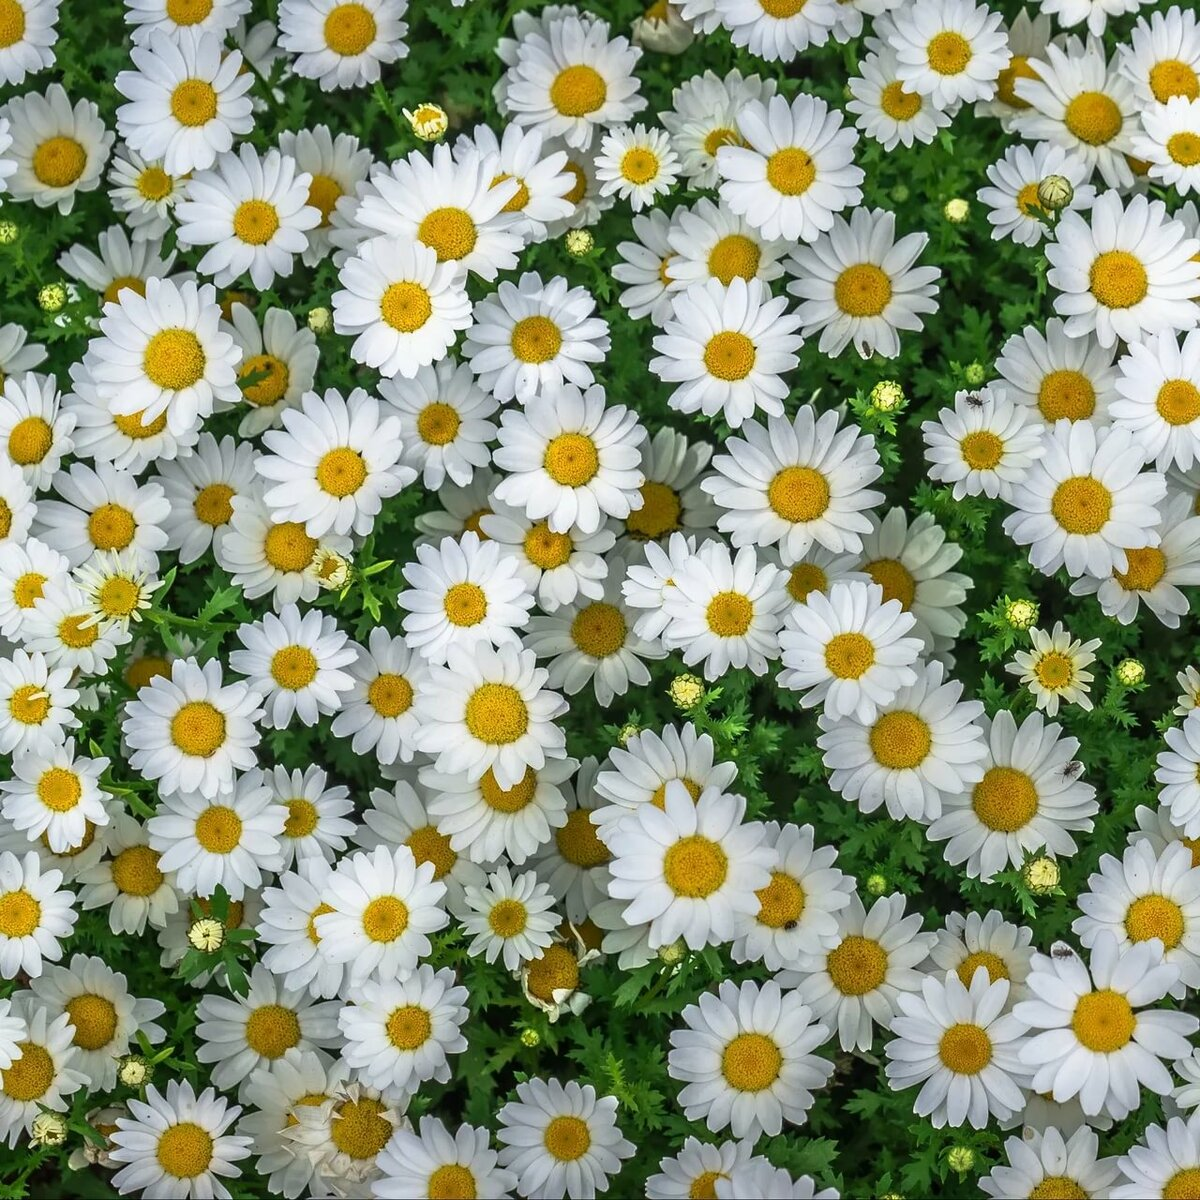 Картинки цветов ромашек